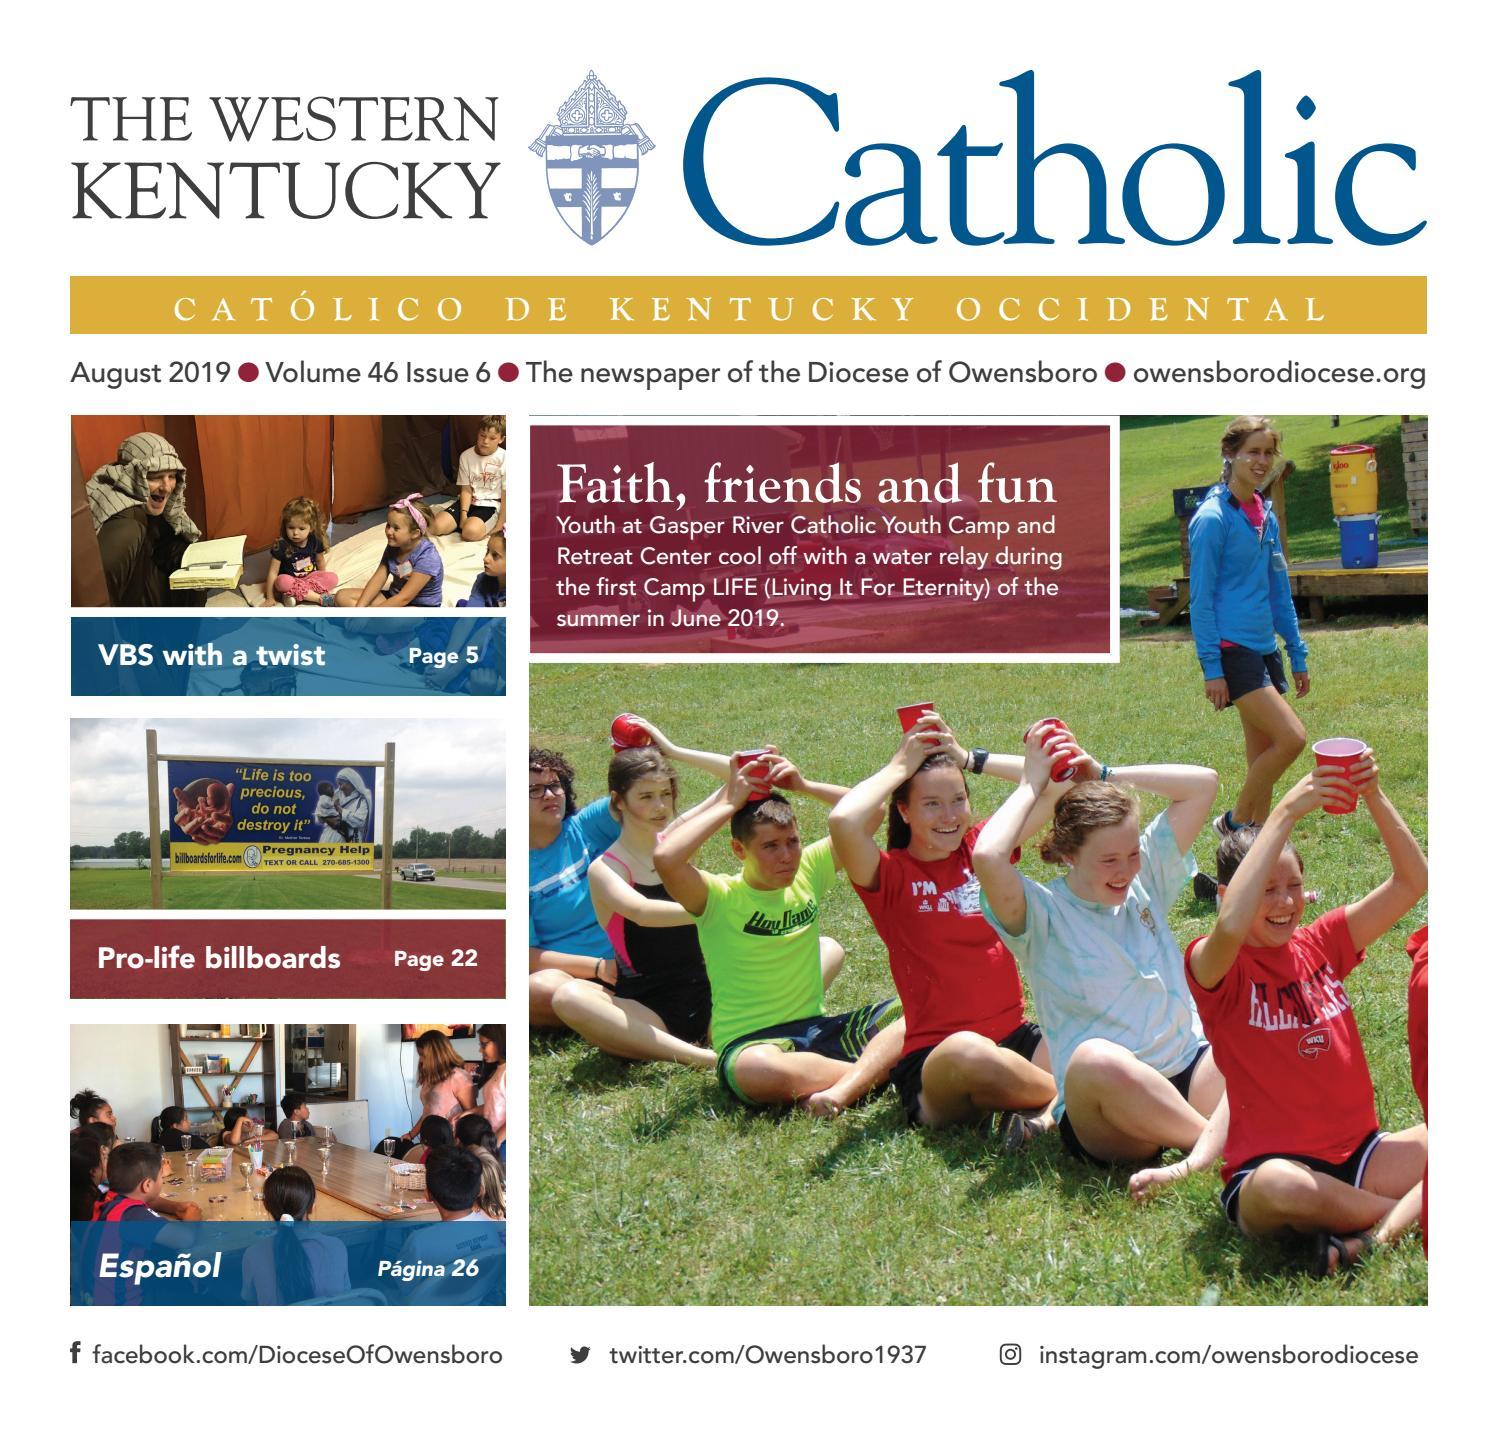 visita prostata roman catholic